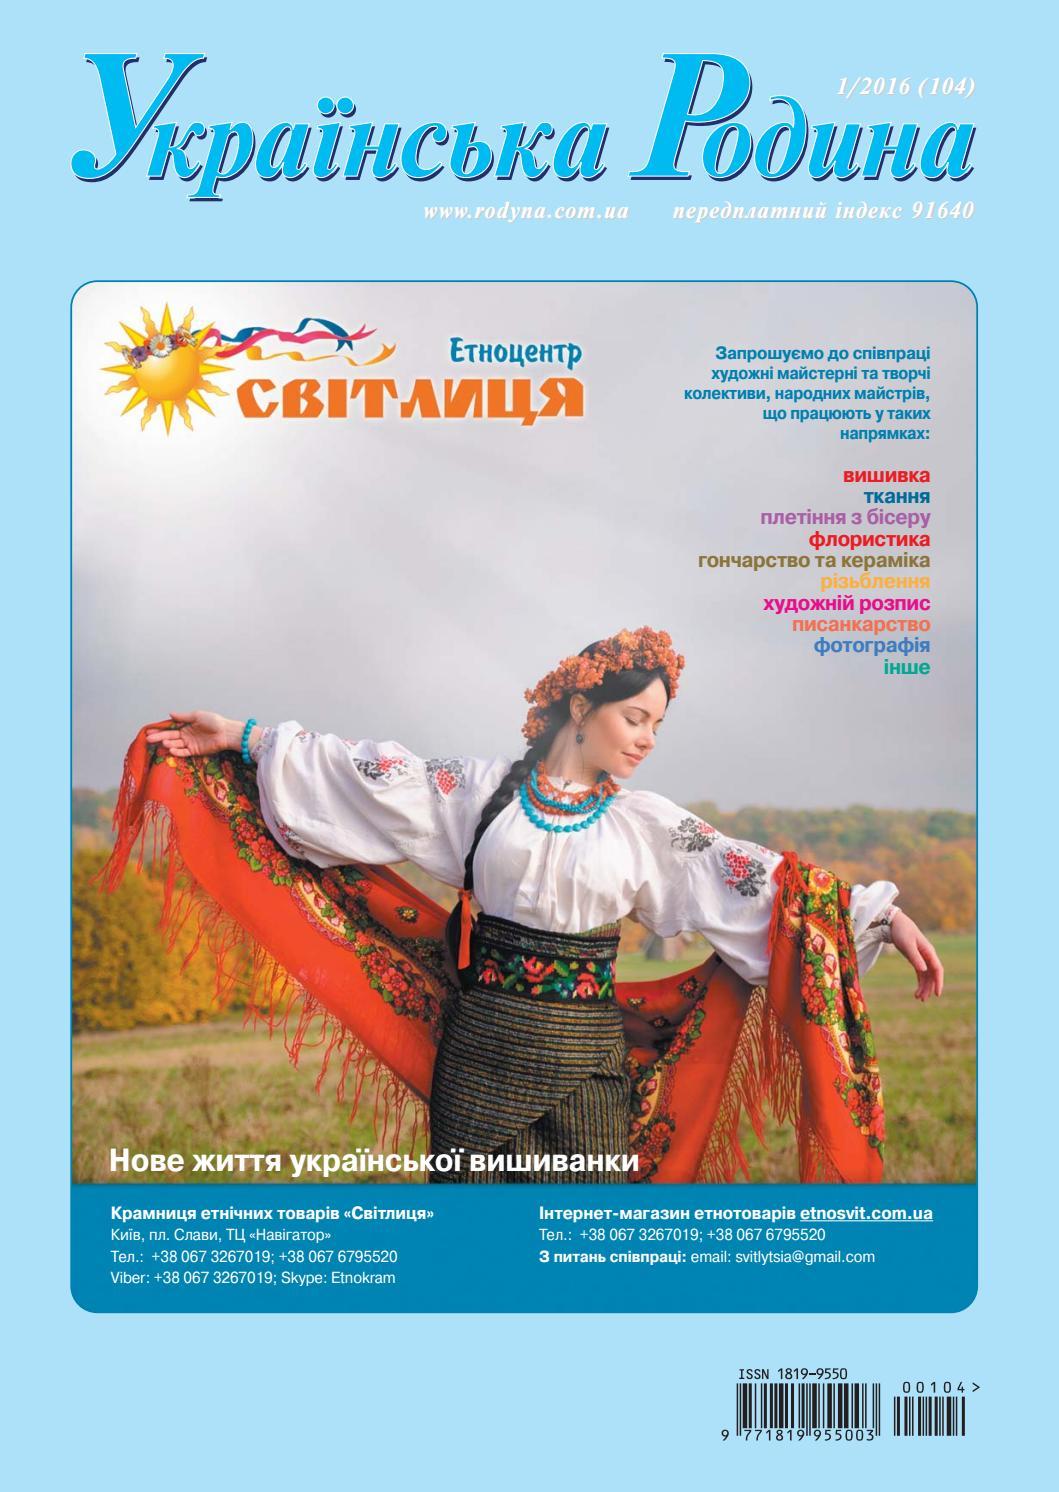 Журнал Українська Родина № 1 2016 р. by Siryj Vovk - issuu a96411e75d511